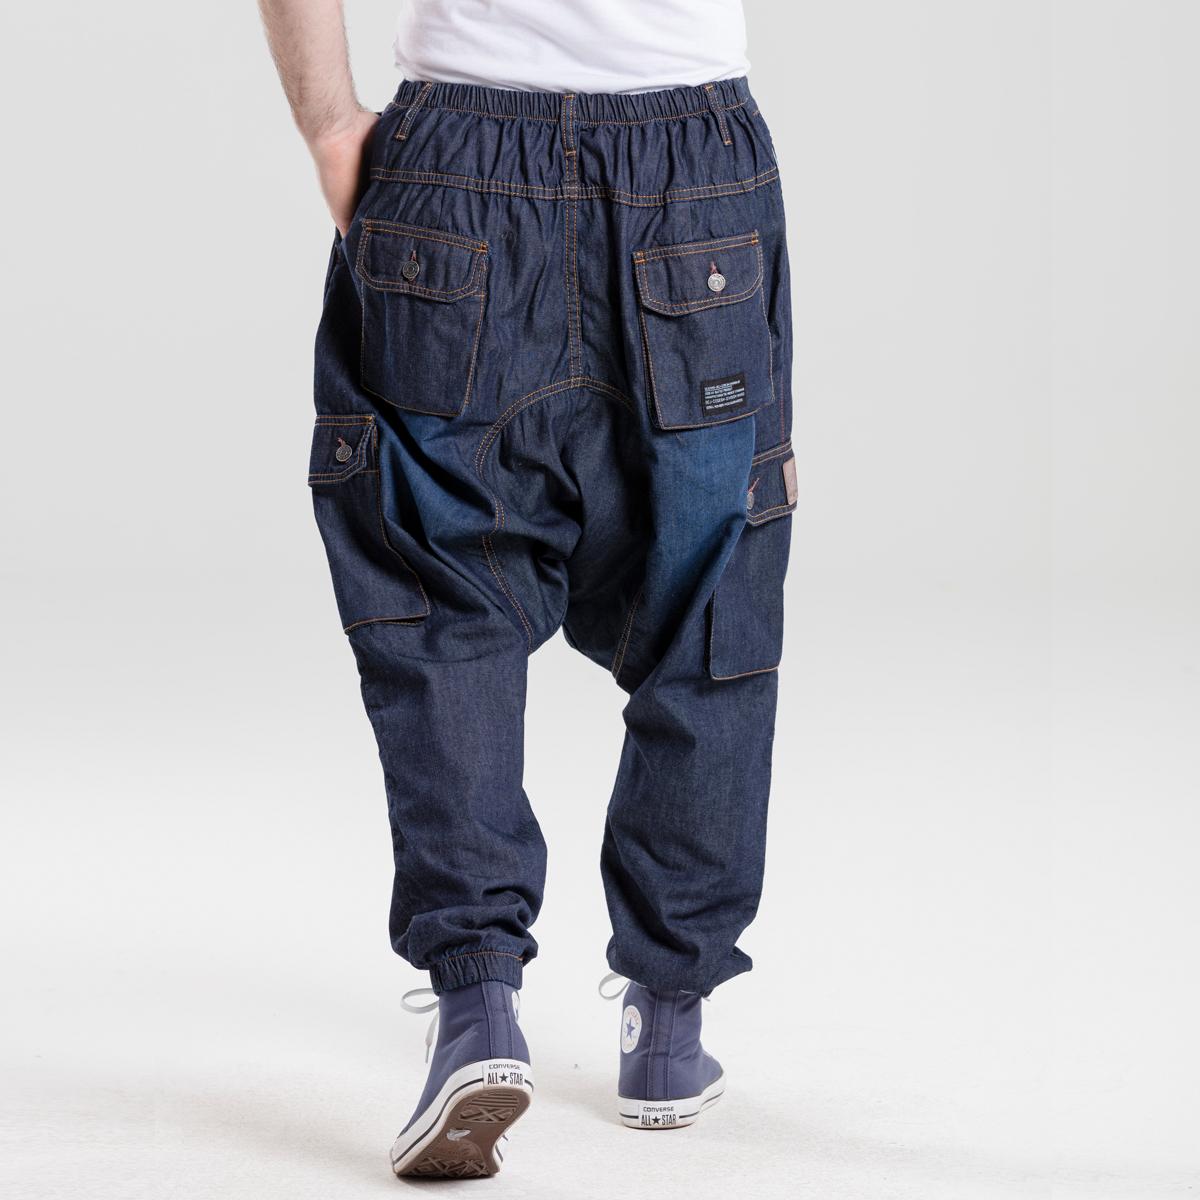 saroual battle evo jeans blue dcjeans dos